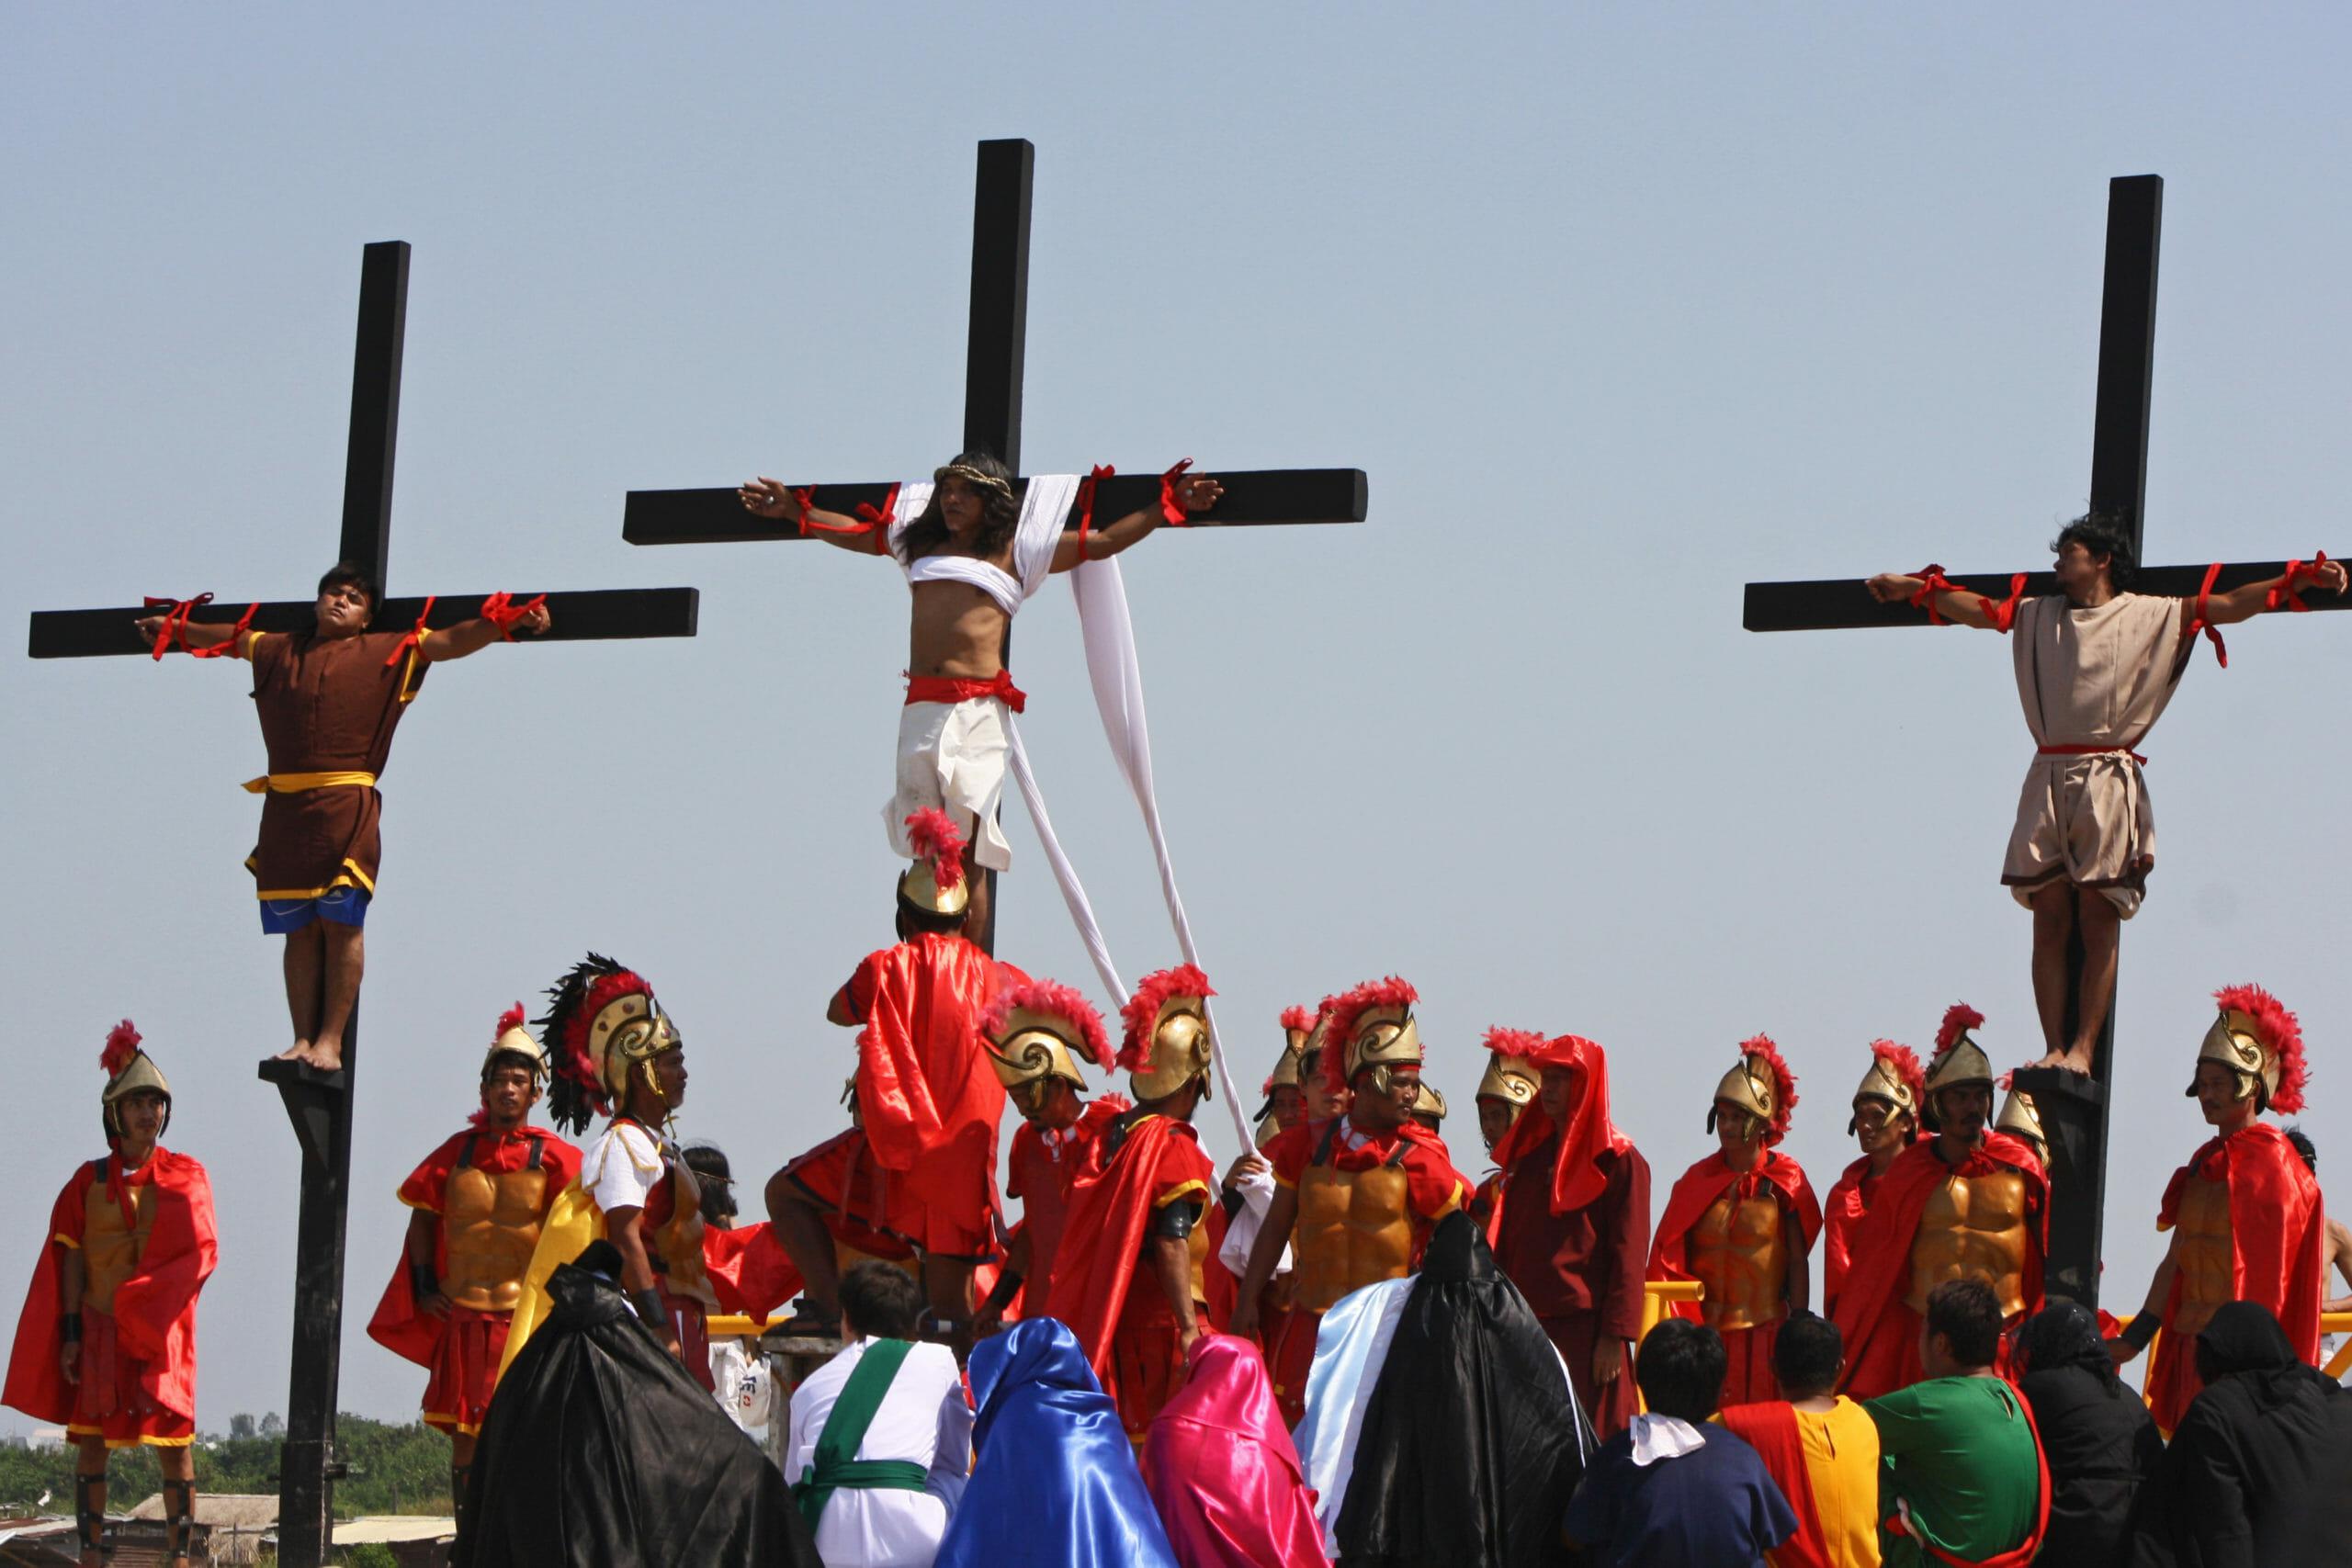 Katolske filippinere korsfæster sig selv i Jesu navn